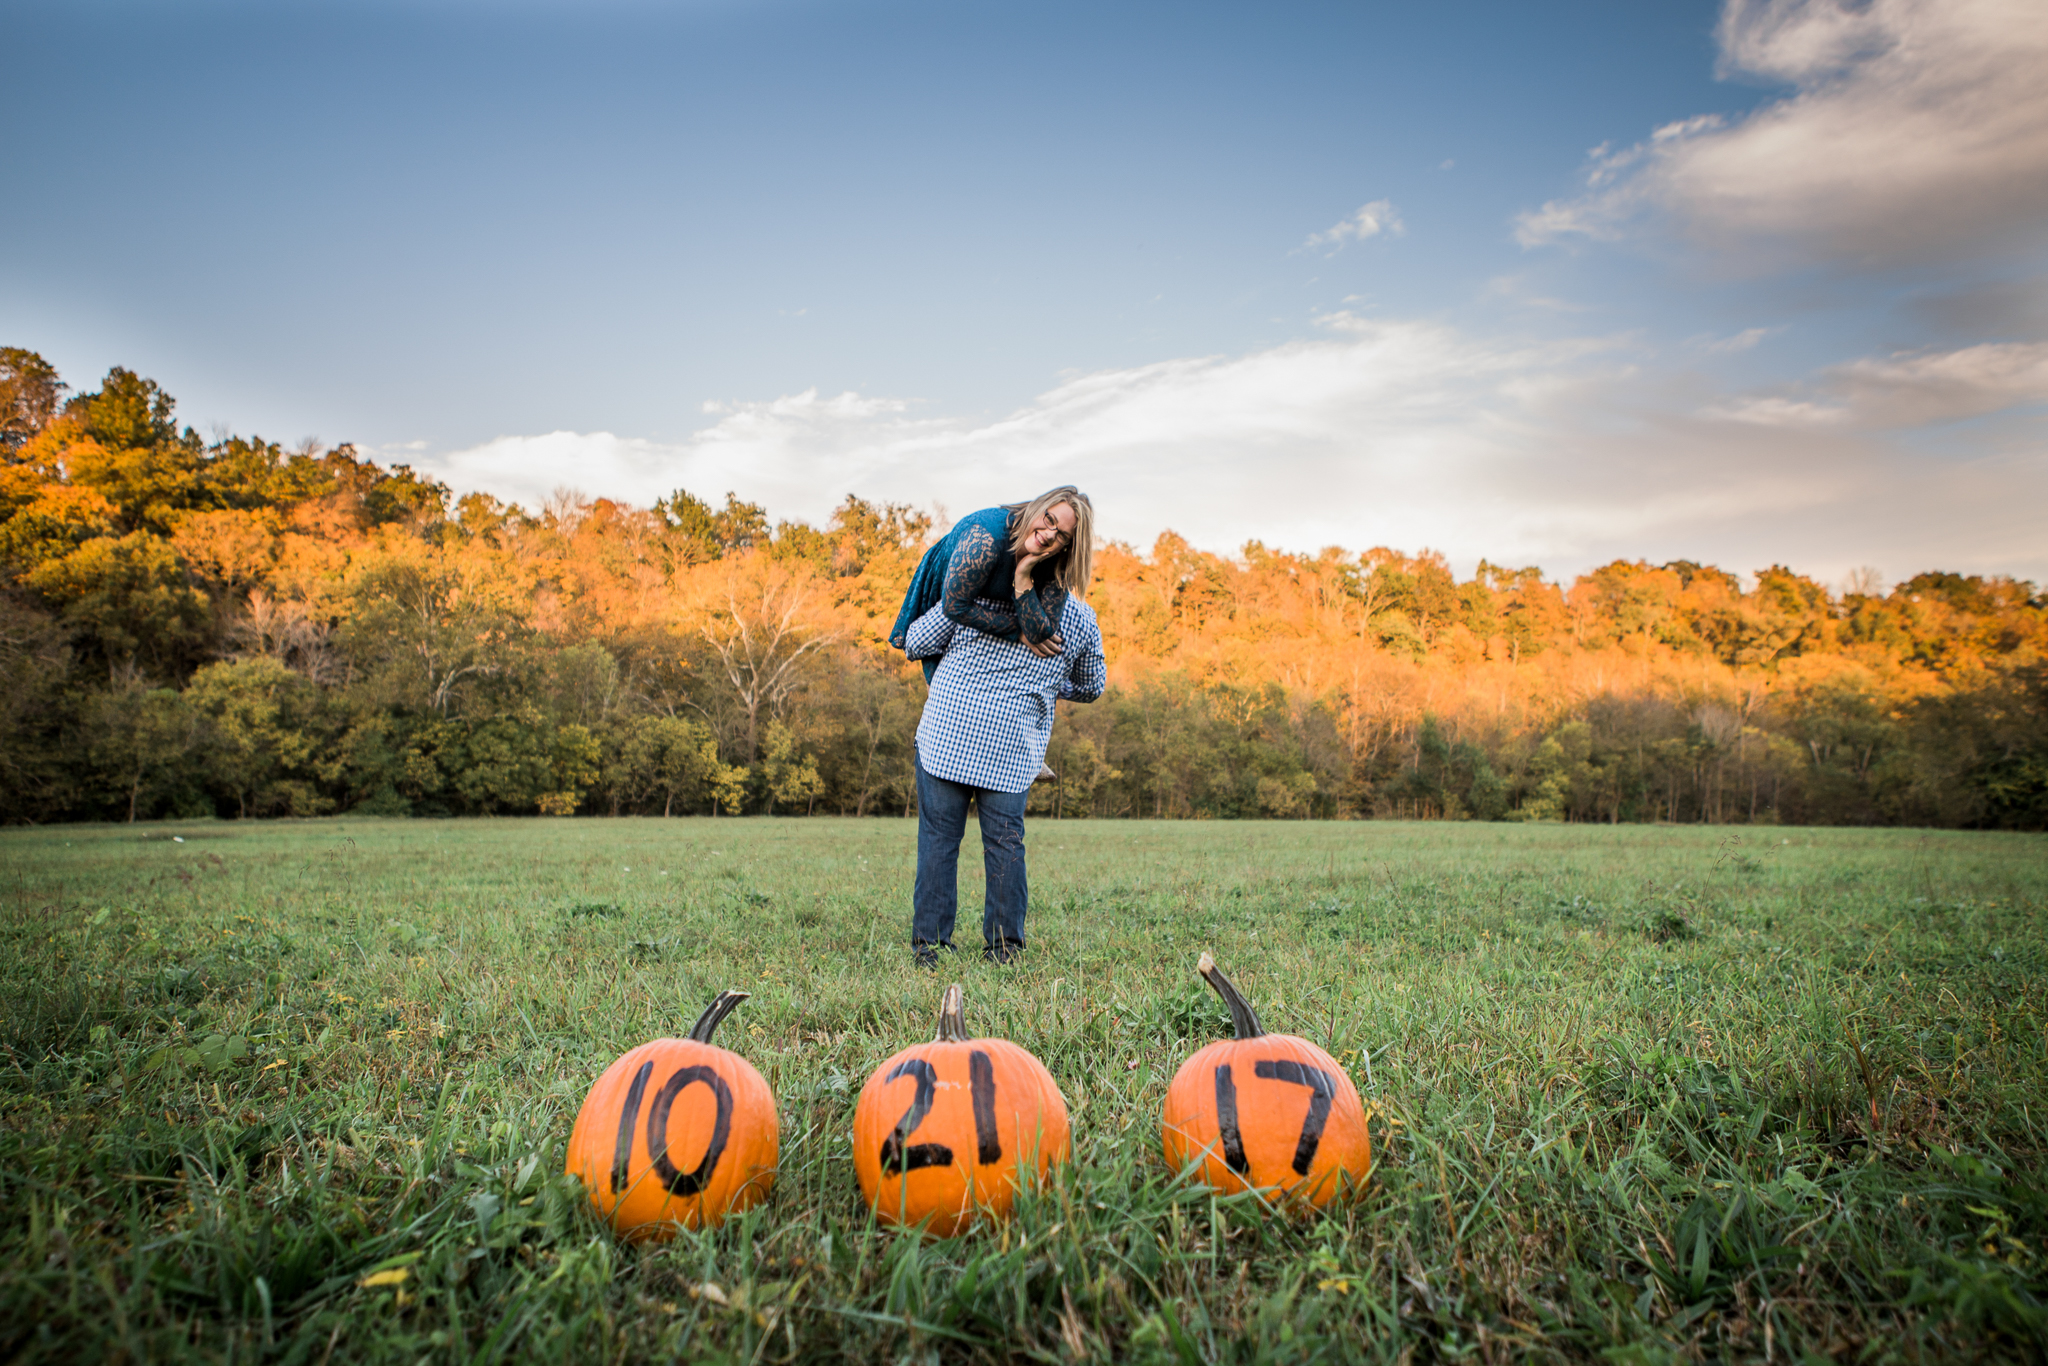 Richmond Kentucky Engagement Photographer - Ariana Jordan Photography -19.jpg